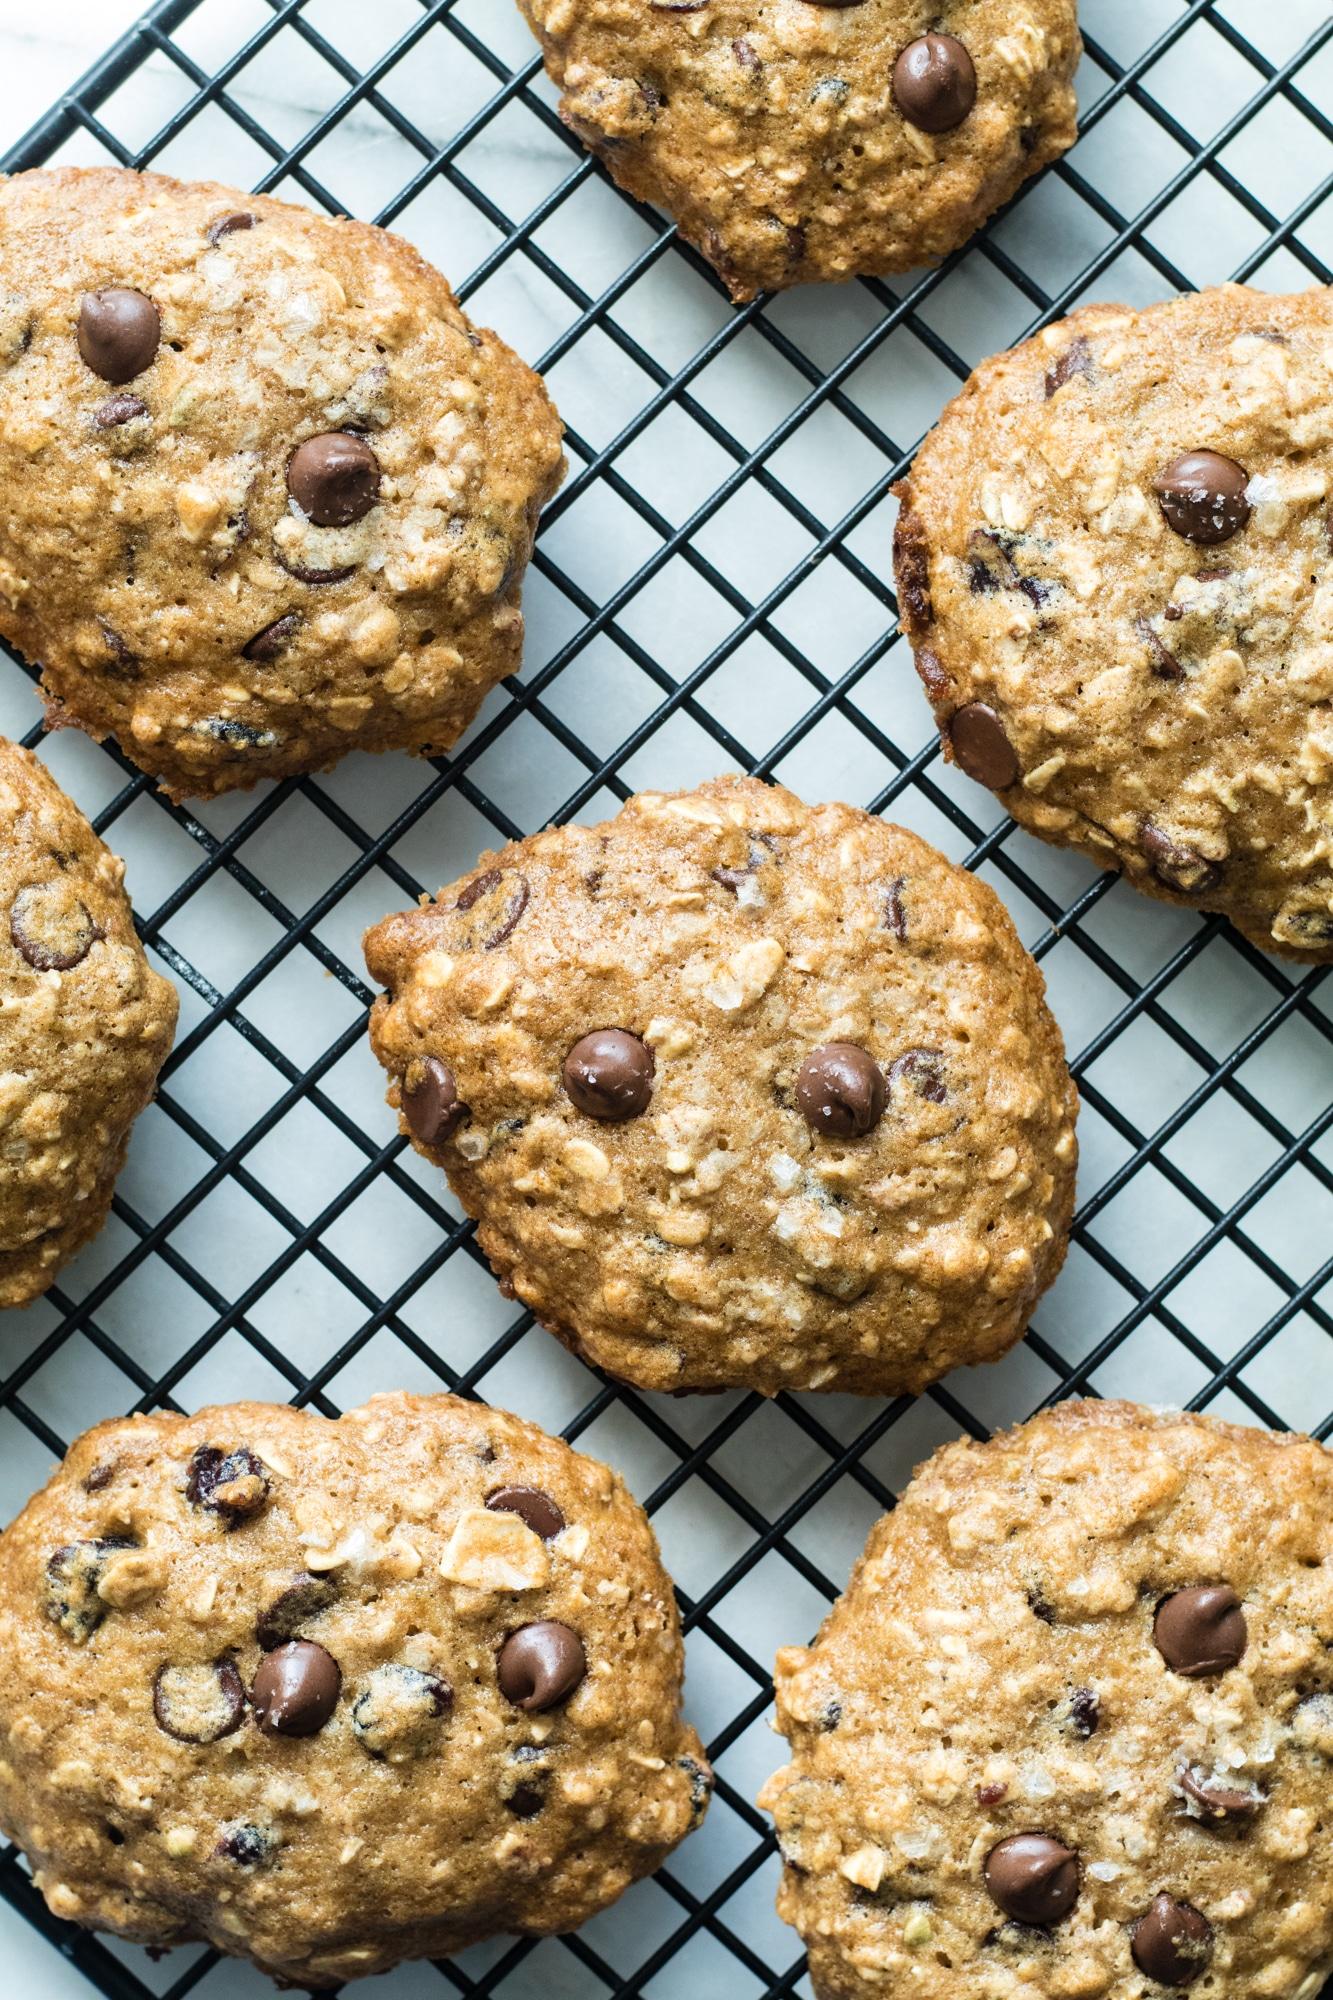 Chocolate Chip Muesli Cookies - for breakfast or for dessert, it's up to you! #cookies #chocolatechips #krollskorner #dessert